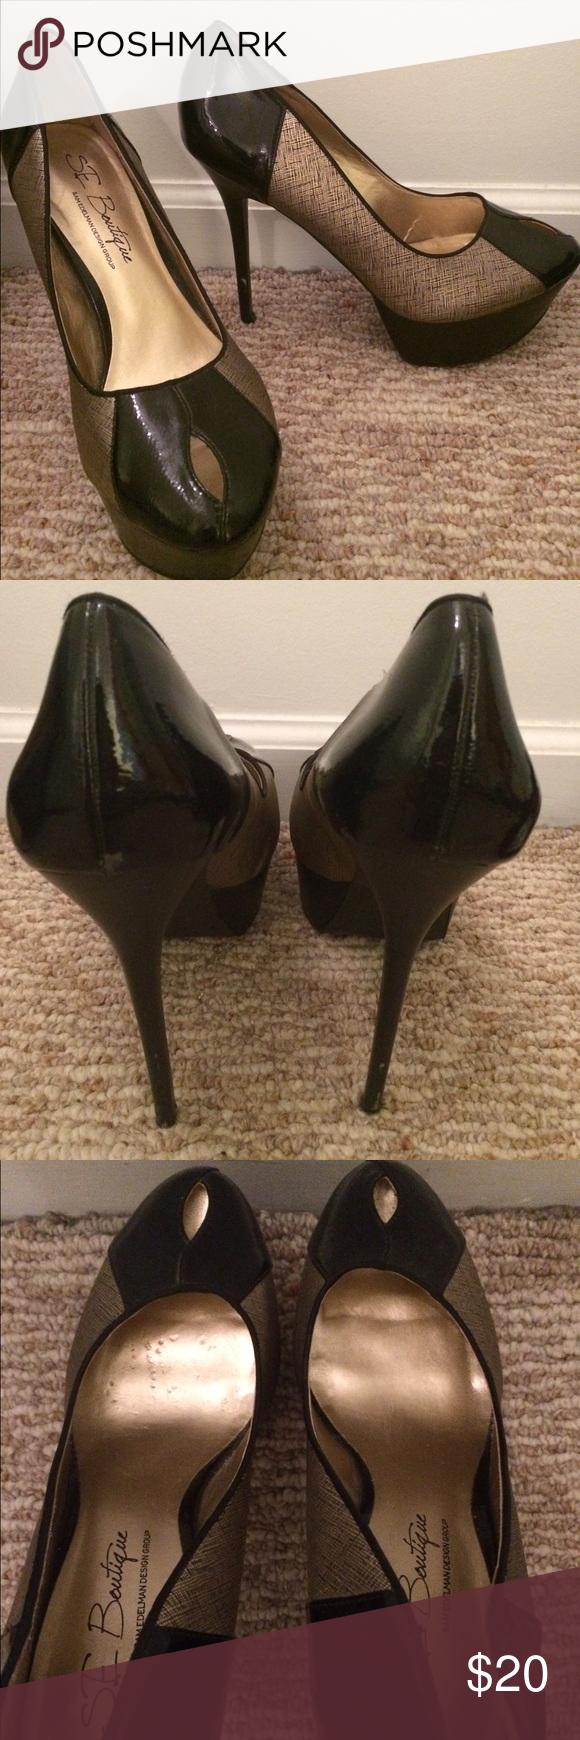 Sam Edelman Pumps Gold and black with platform skinny heel Sam Edelman Shoes Heels